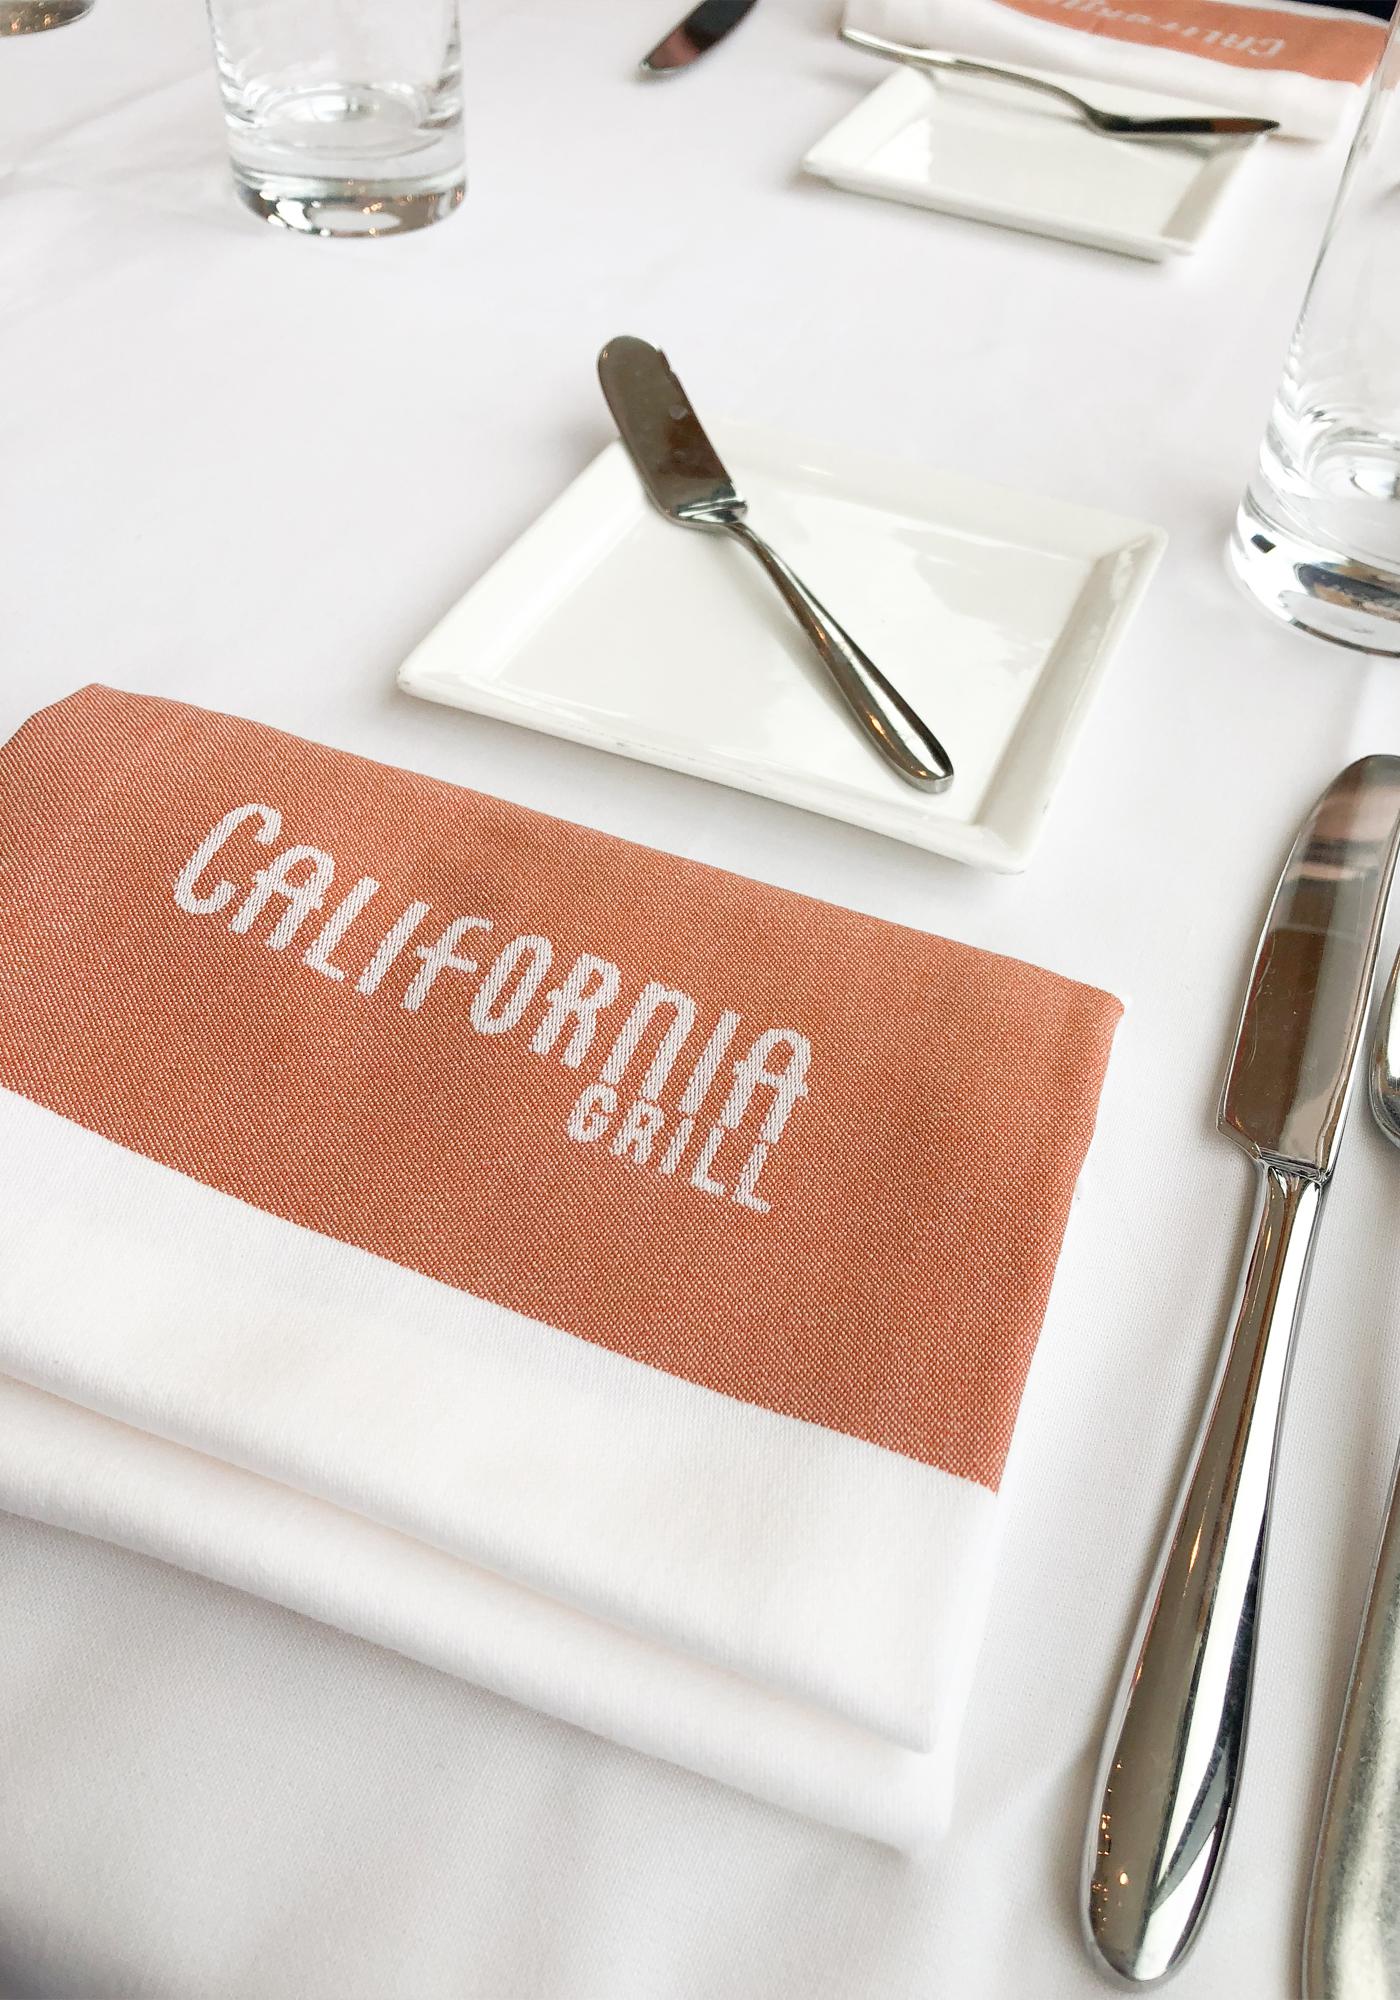 Gluten Free at Walt Disney World - California Grill Brunch